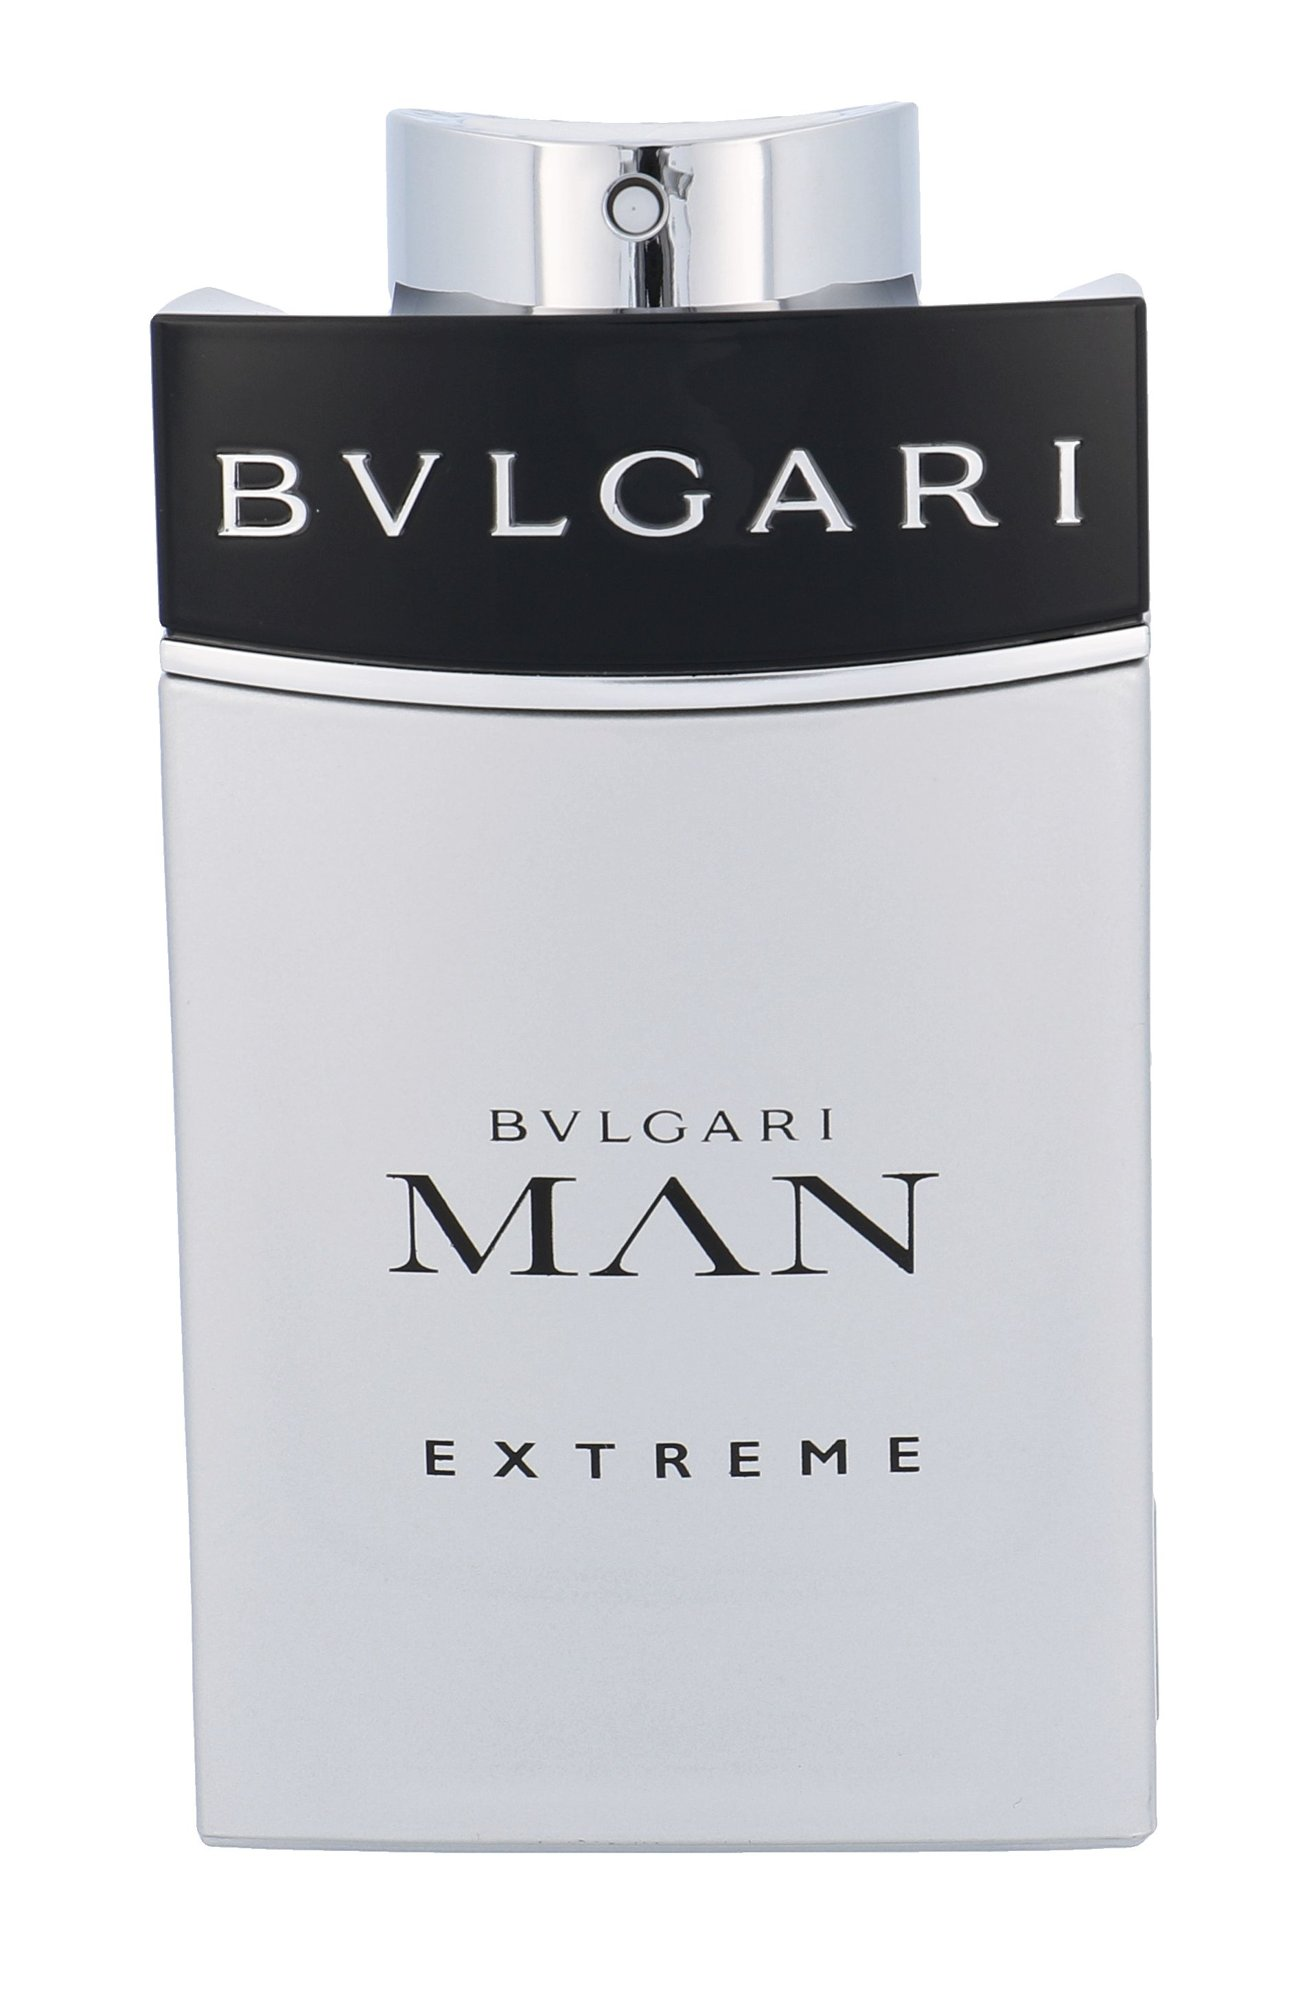 Bvlgari Bvlgari Man Extreme EDT 100ml